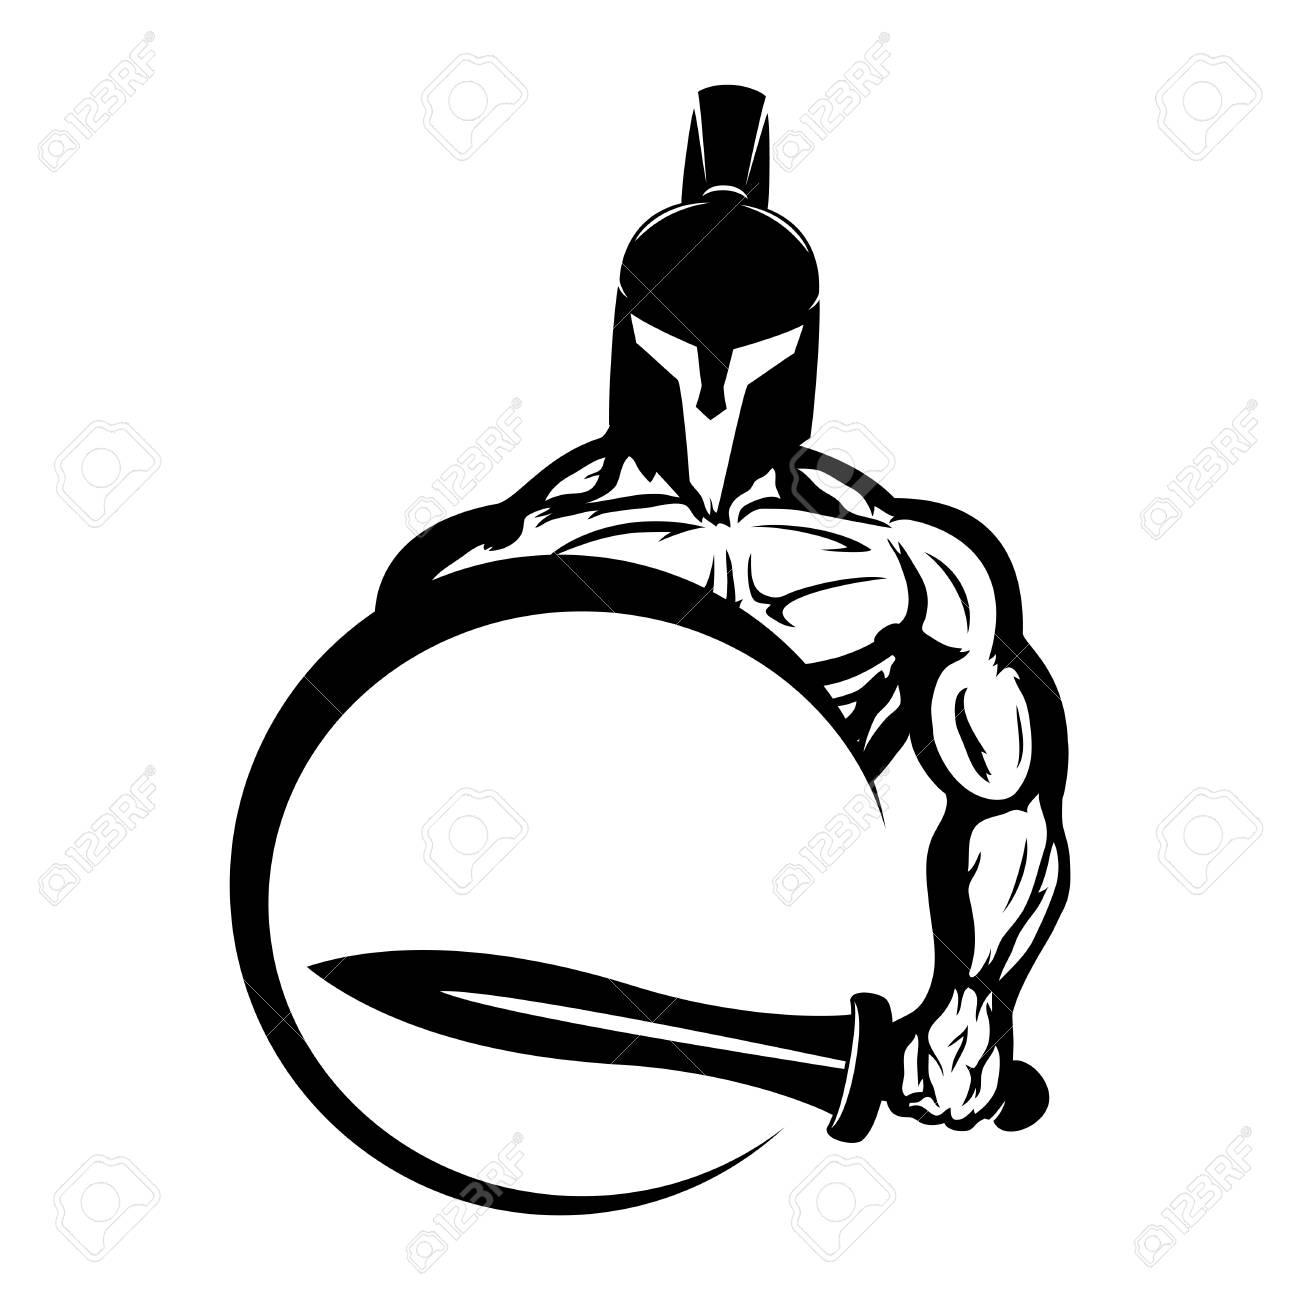 Leonidas Shield | Free Images at Clker.com - vector clip art online,  royalty free & public domain